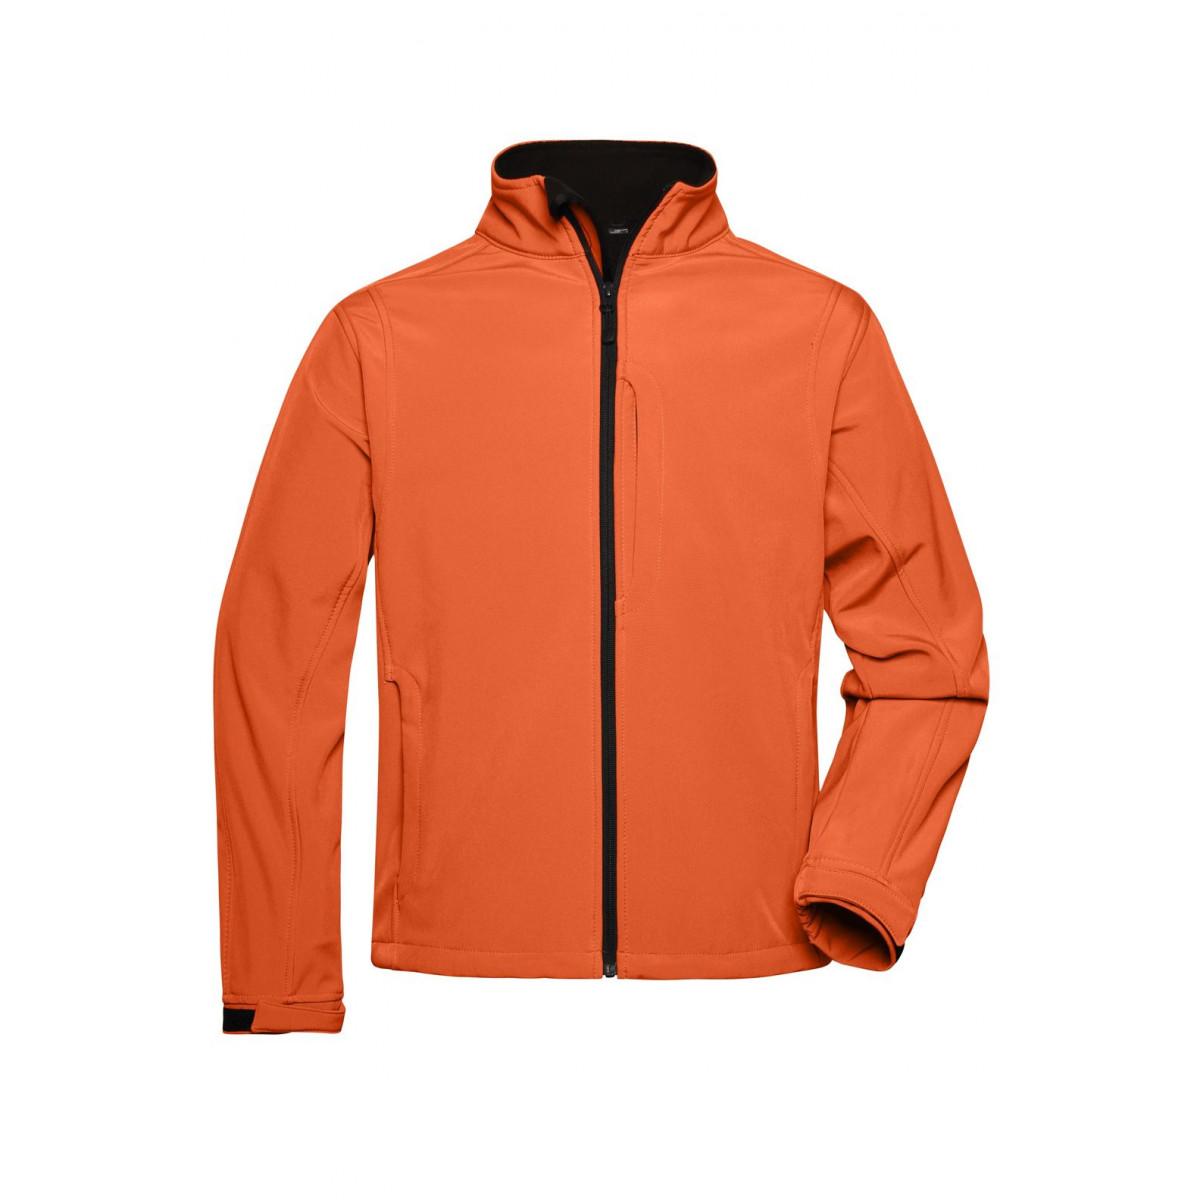 Куртка мужская JN135 Mens Softshell Jacket - Оранжевый